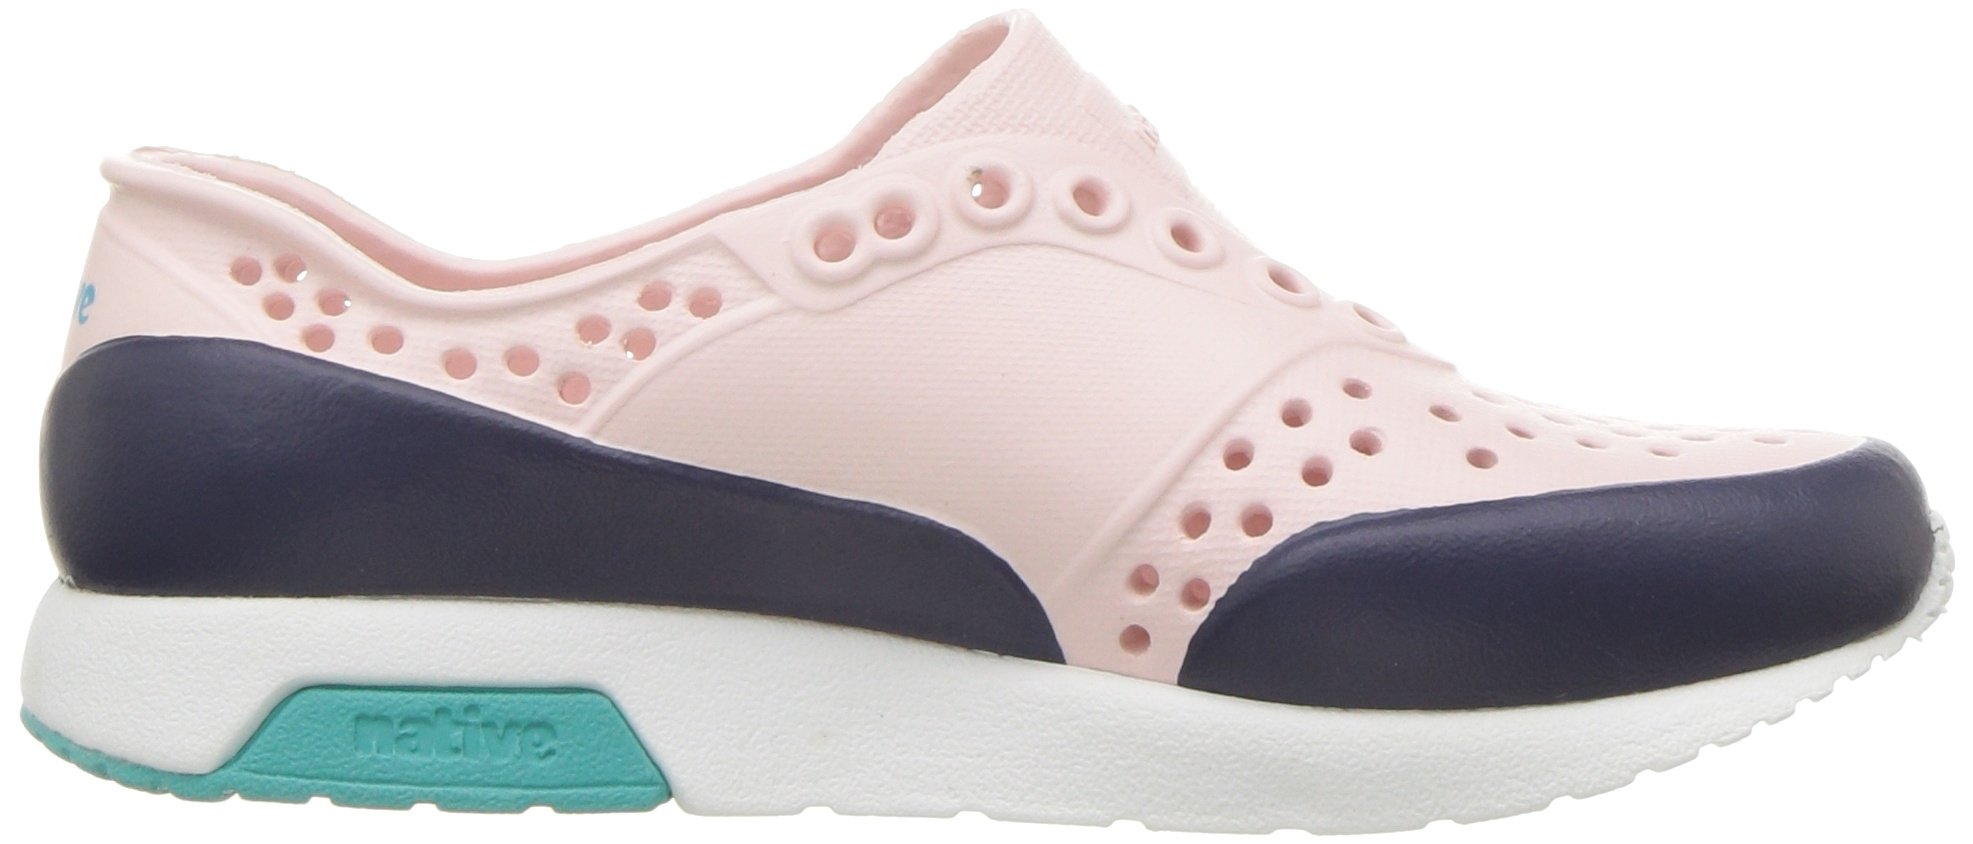 native Kids Unisex-Kids Lennox Block Child Sneaker, Cold Pink/Shell White/Glacier Green/Regatta Blue Block, 13 Medium US Little Kid by native (Image #7)